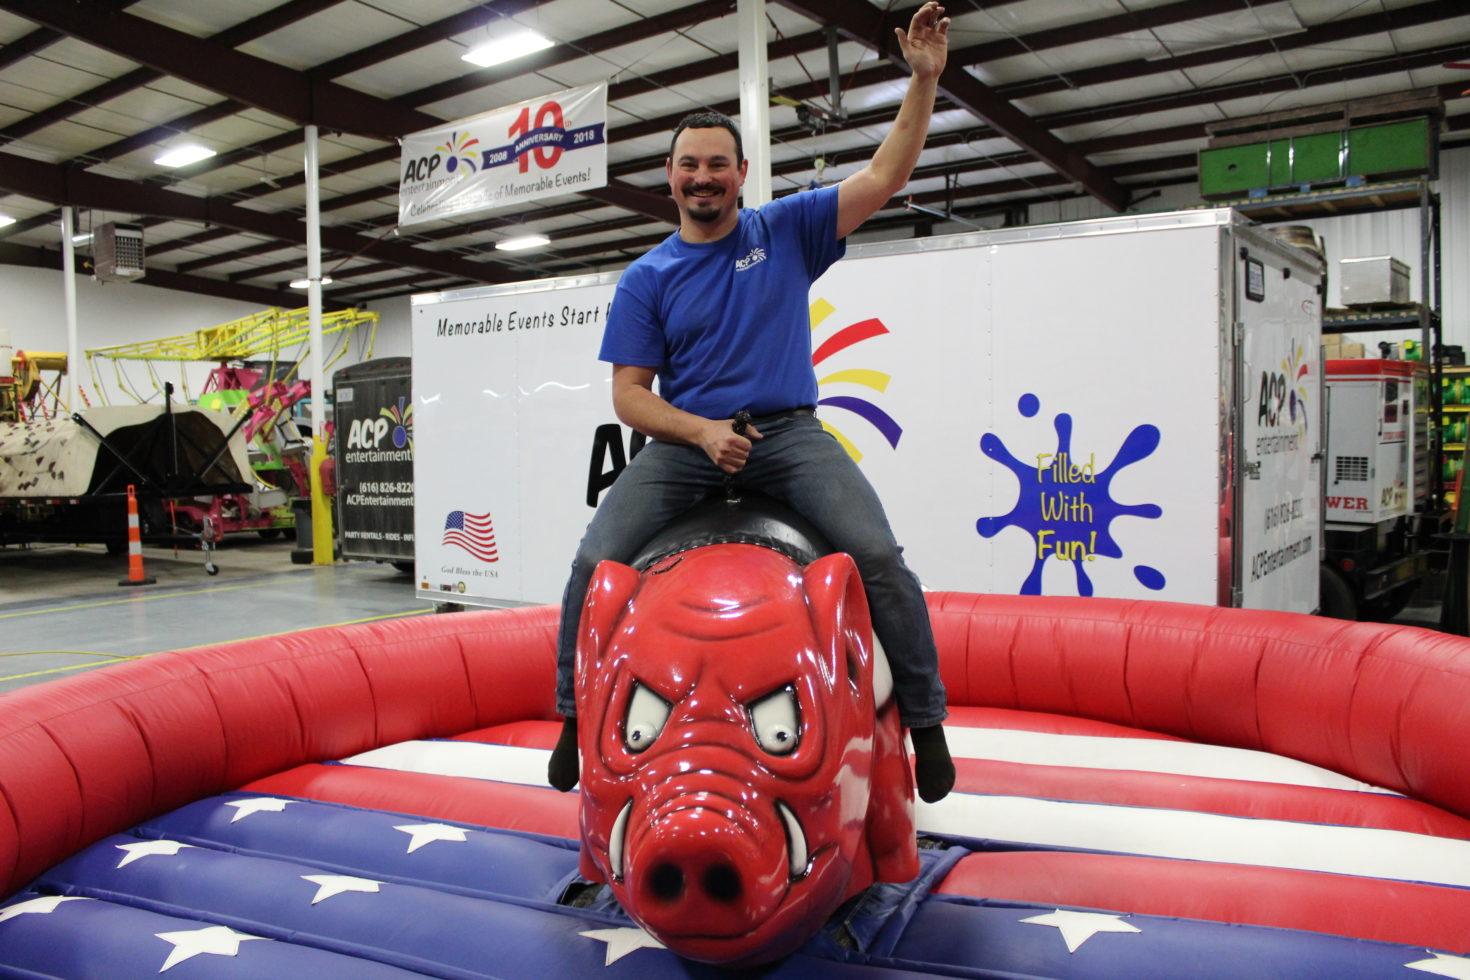 Guy riding mechanical hog pig ride michigan